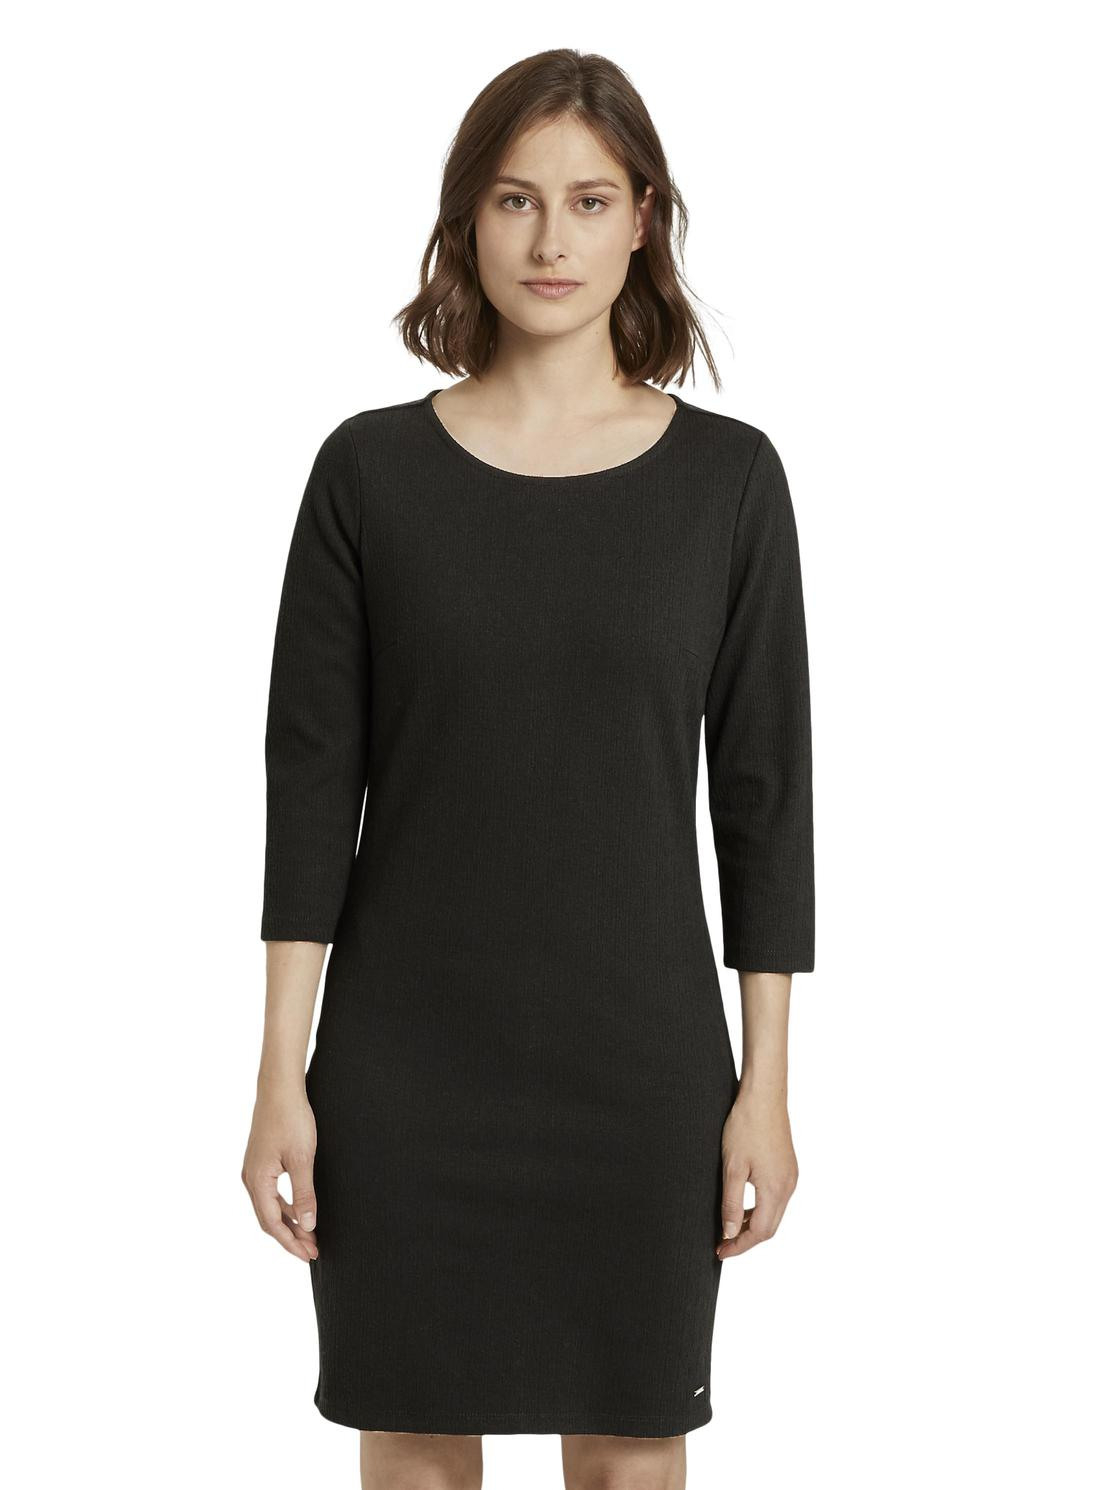 Tom Tailor Denim Kleid 10589401  Kleider  Damen  Wöhrl